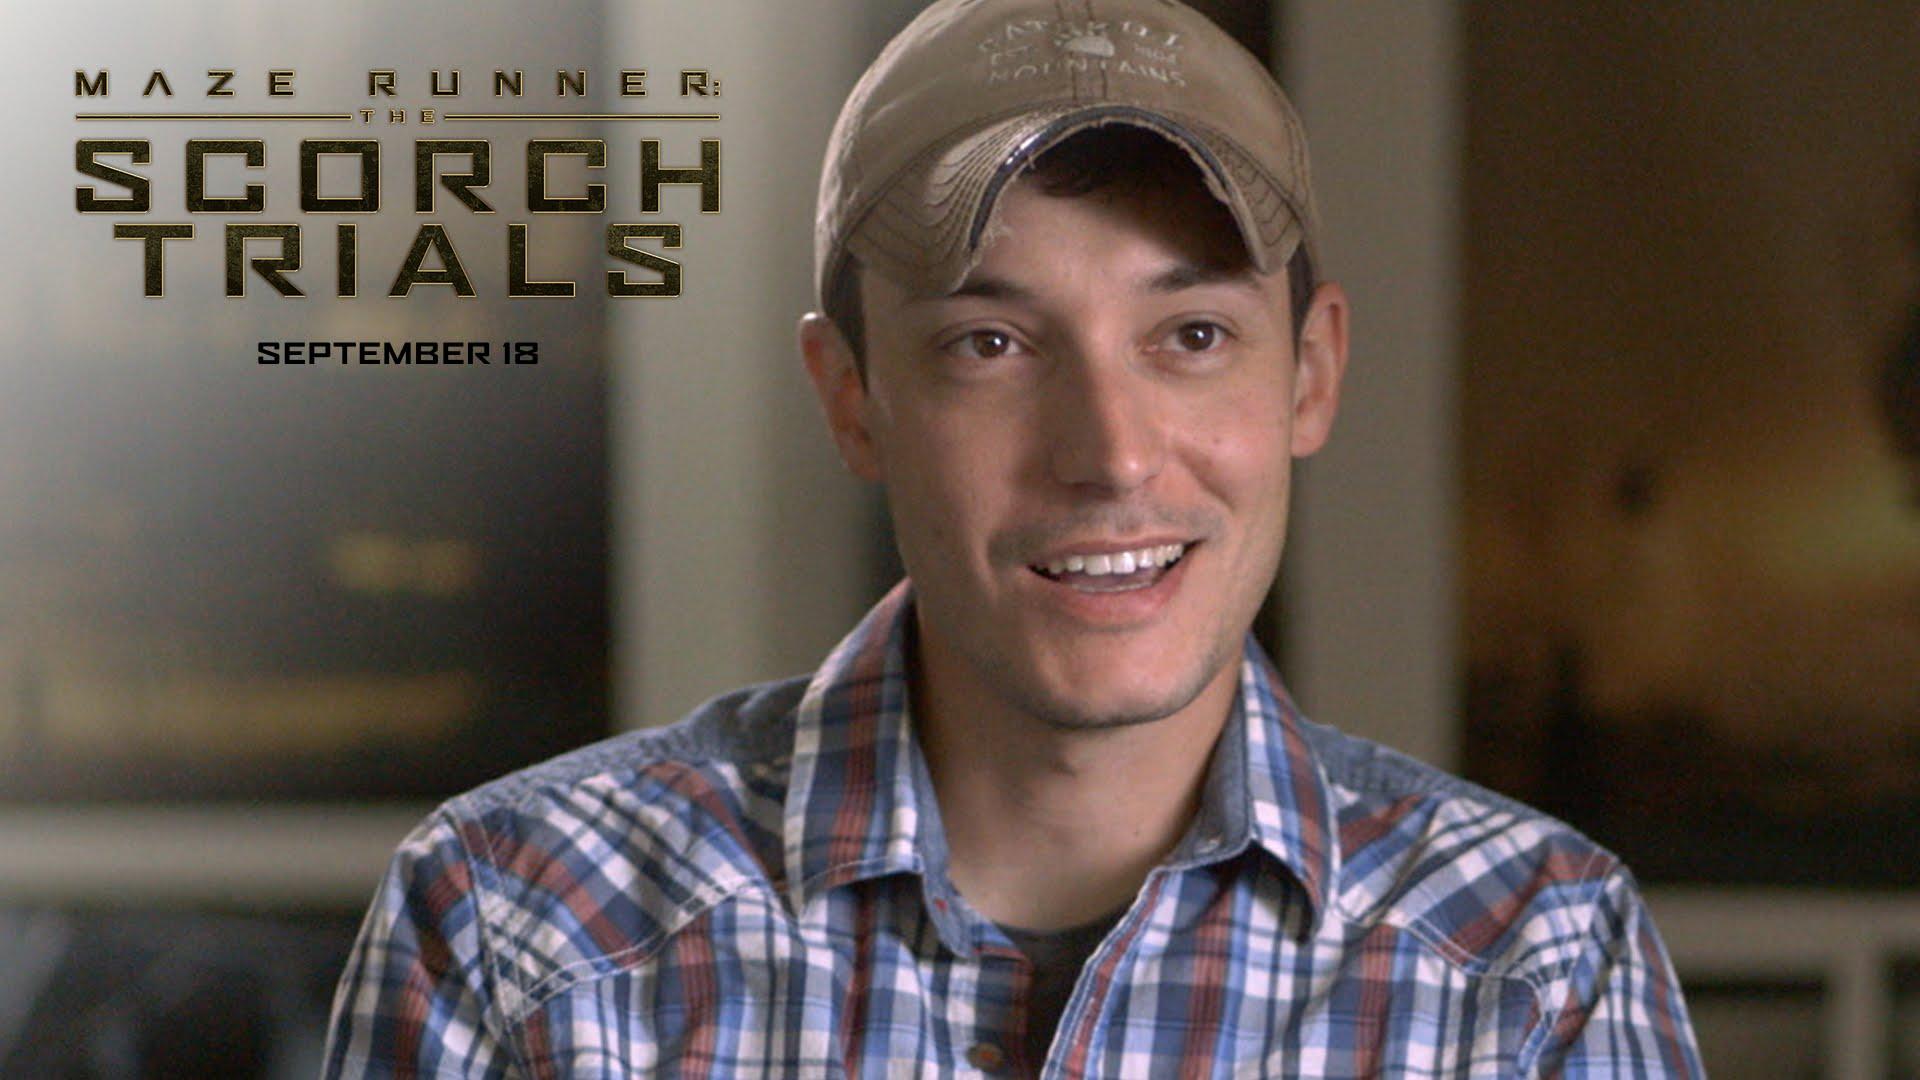 Maze Runner: The Scorch Trials | Wes Ball [HD] | 20th Century FOX